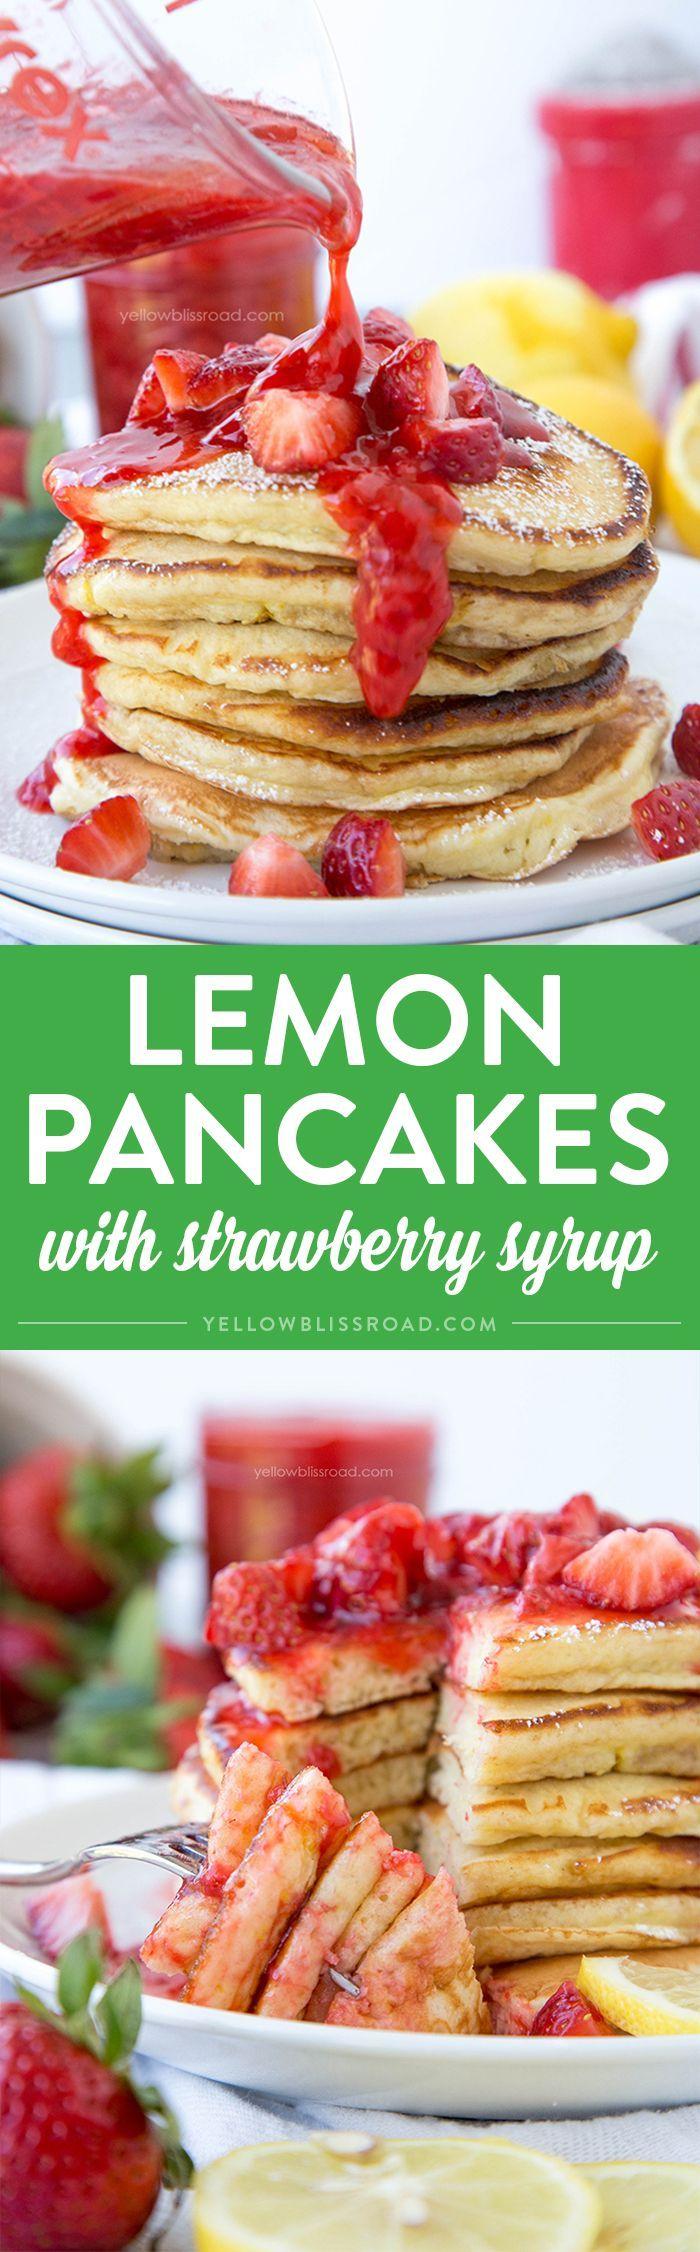 Lemon Pancakes with Fresh Homemade Strawberry Syrup - for brunch, breakfast or even dinner!